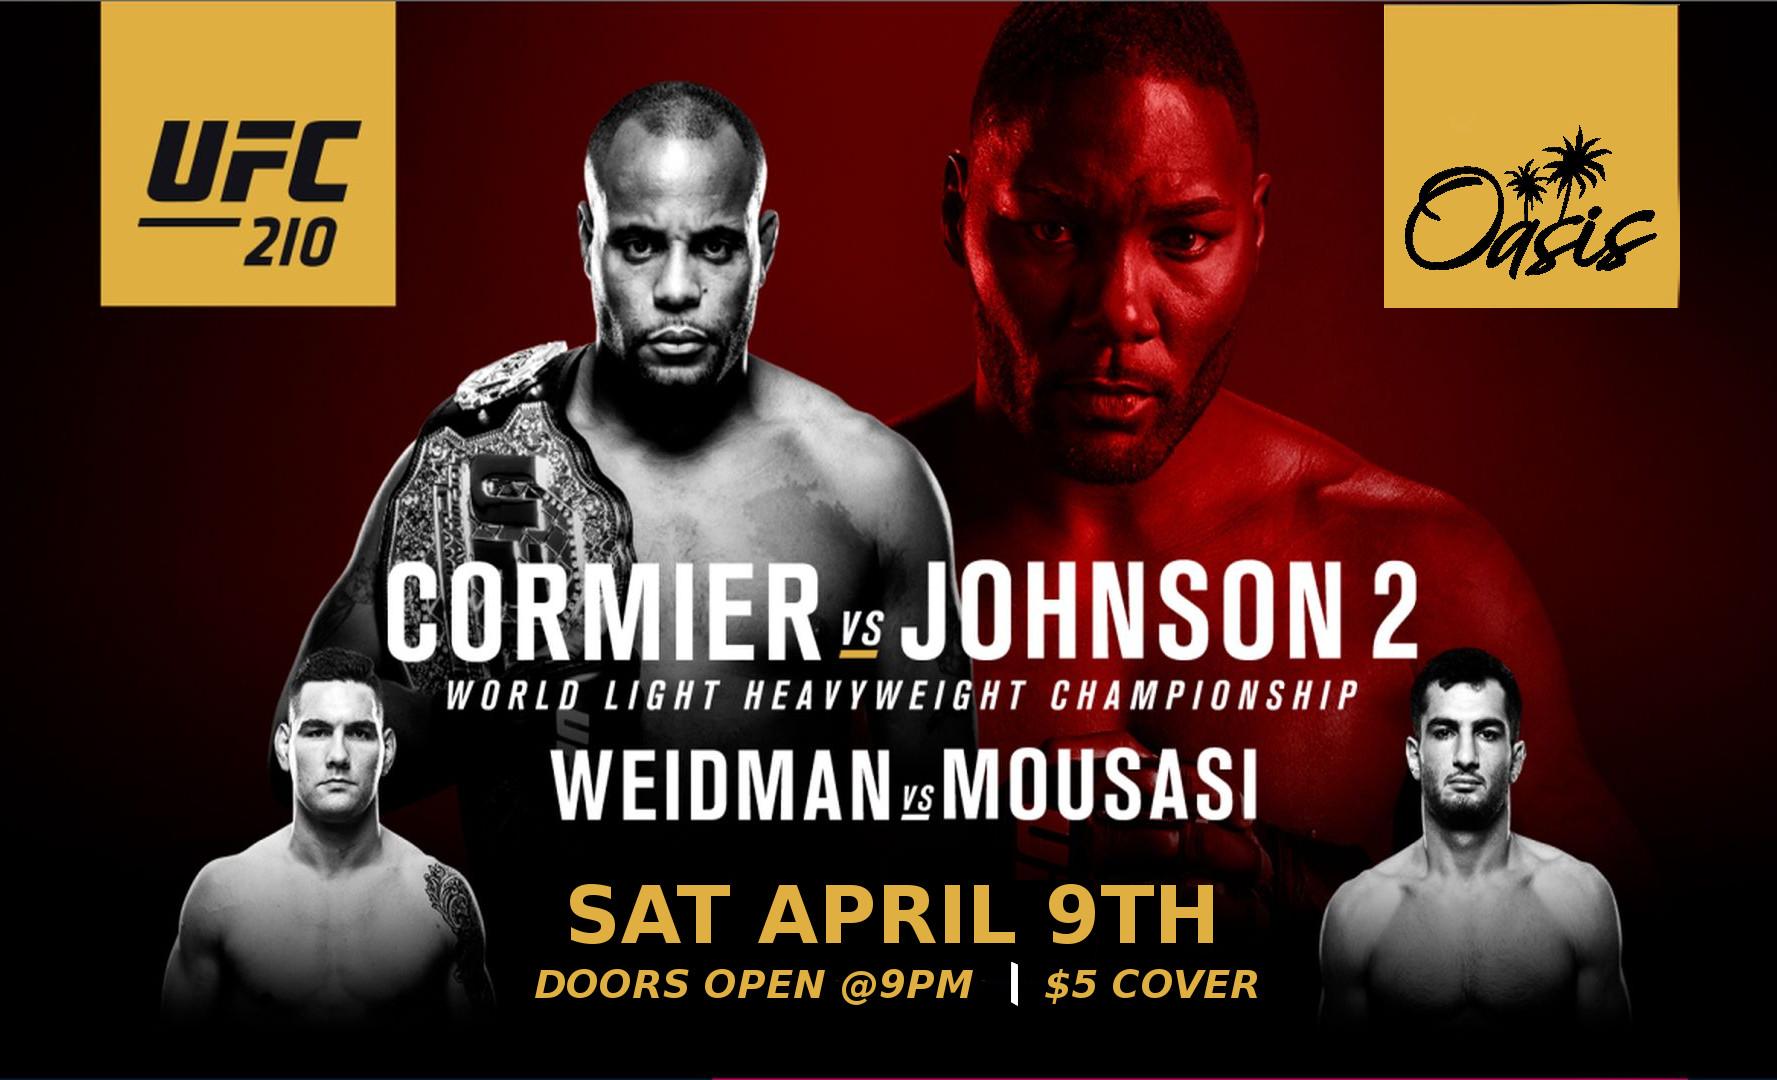 UFC 210 April 9th